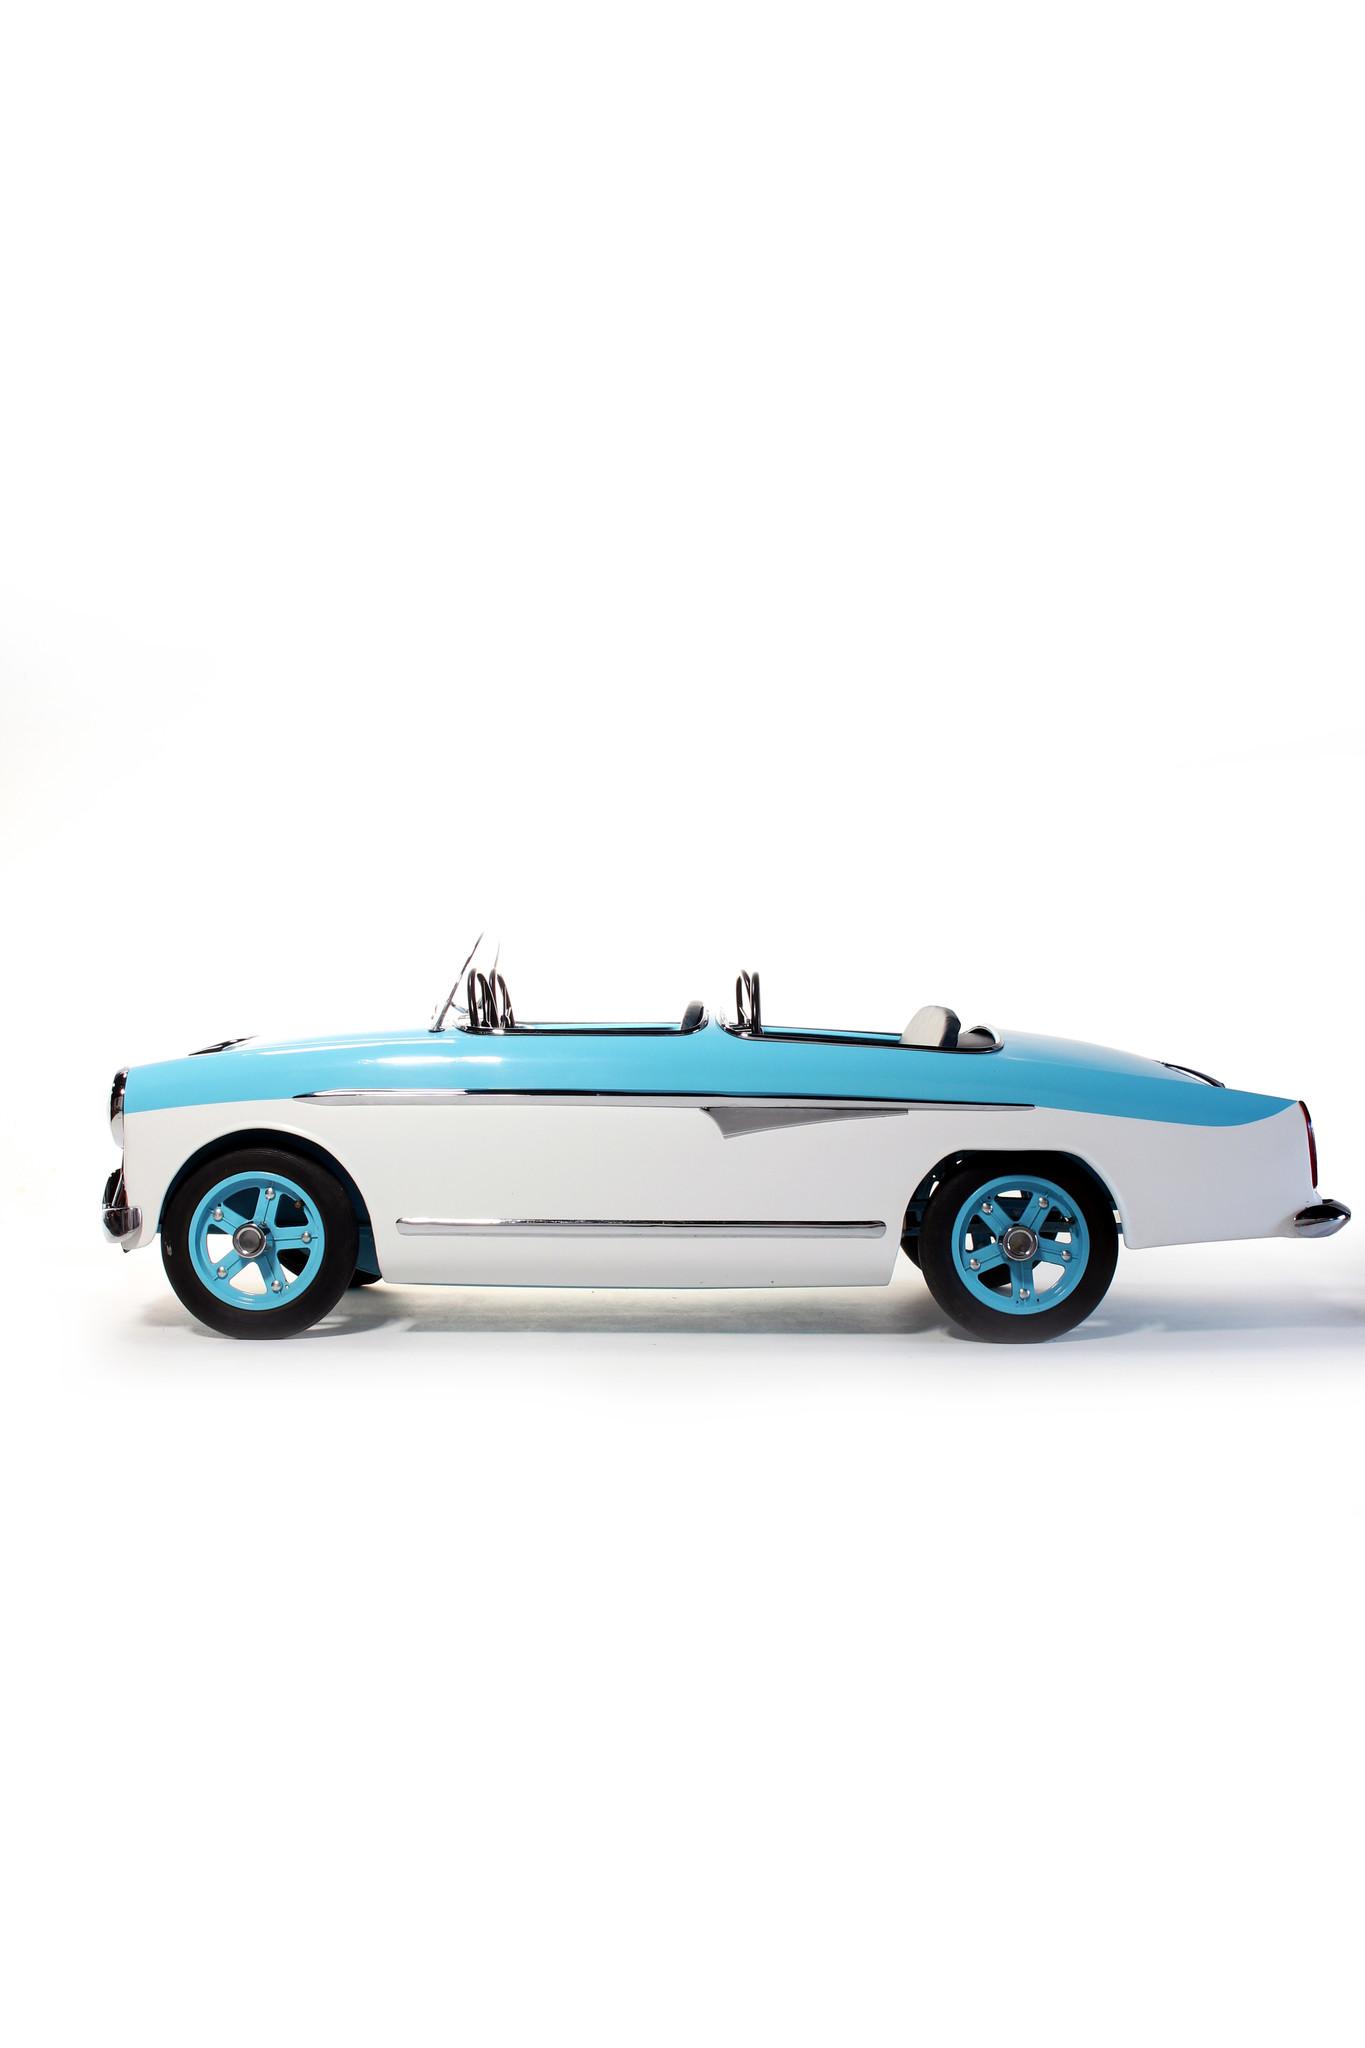 Studebaker carousel car